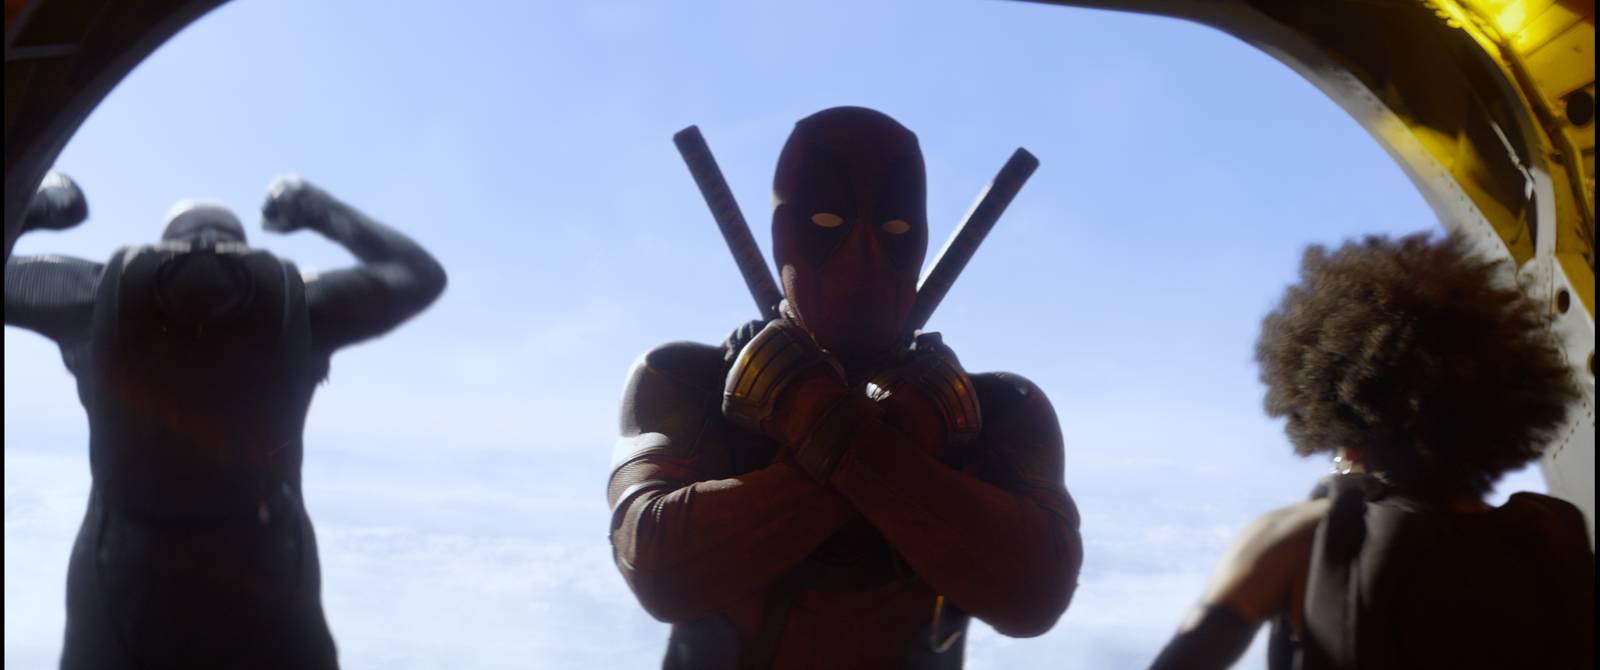 Fotogaléria Deadpool 2 (2017)